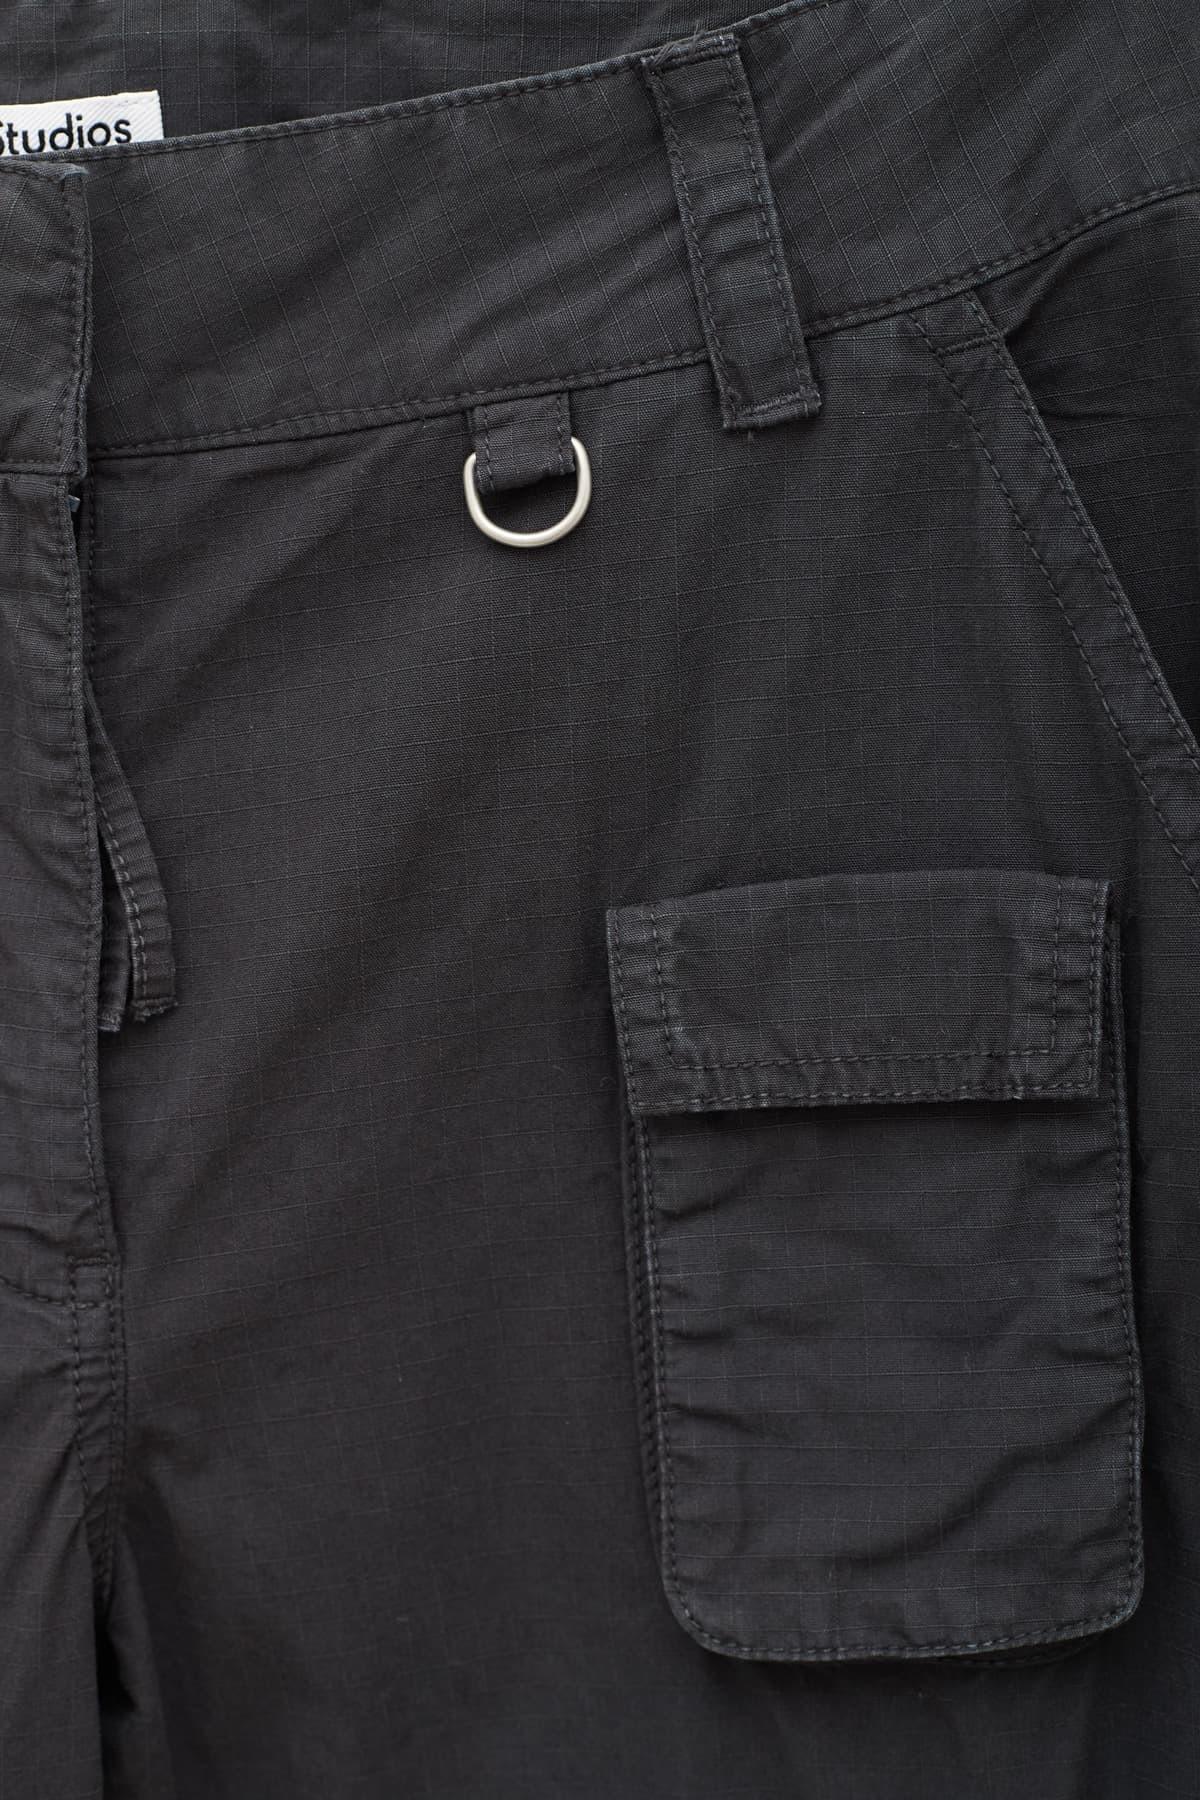 Comprar Acne Studios Black Square Toe SHOE000470 Loafer Shoes